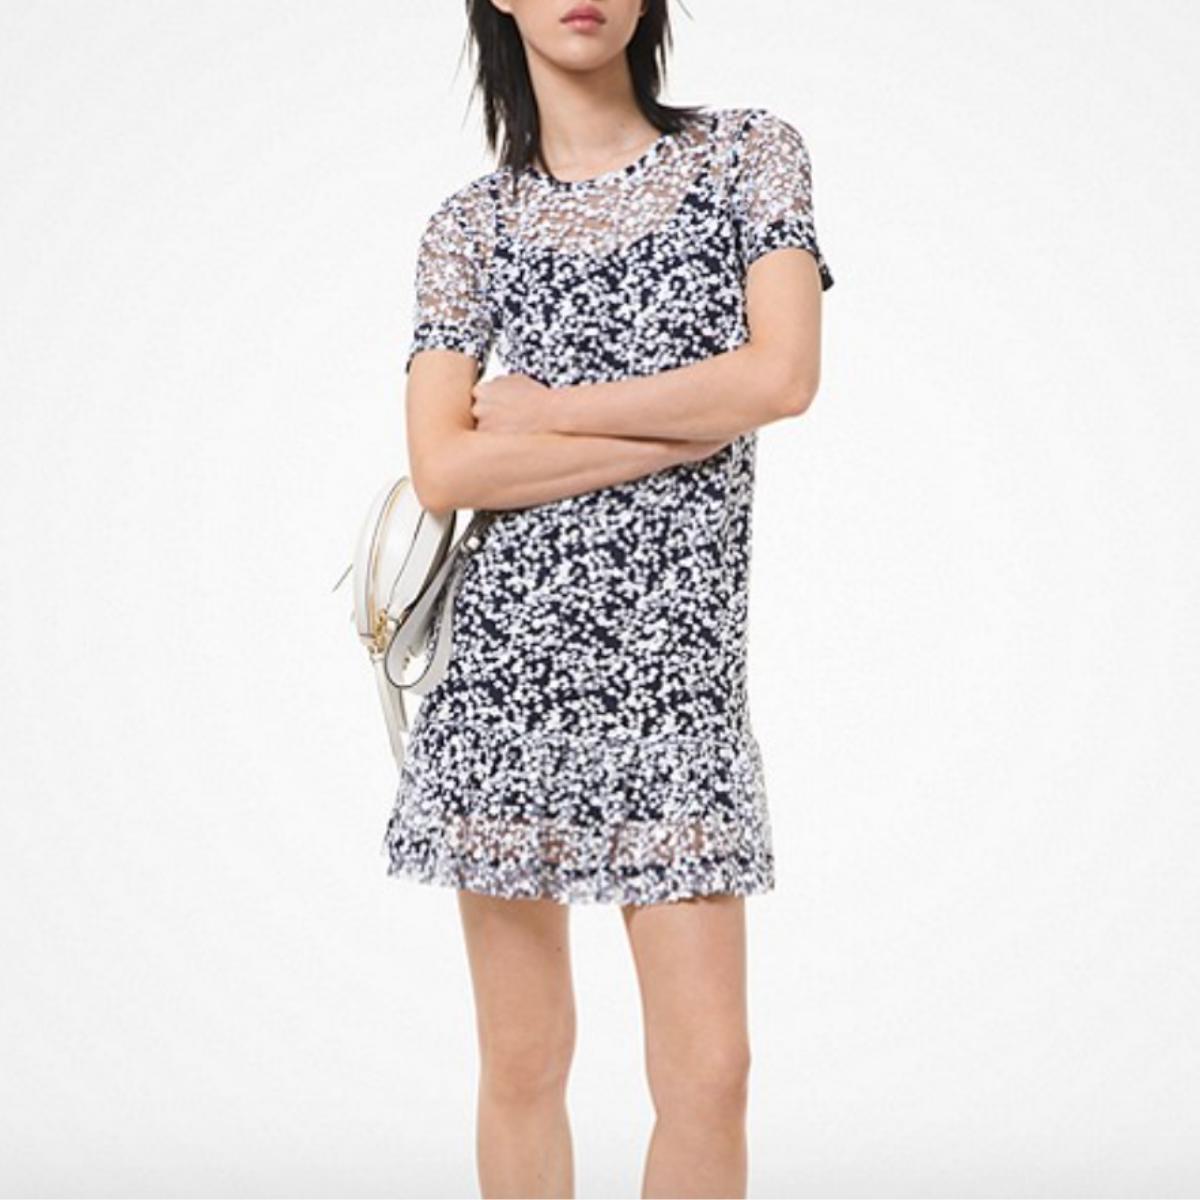 Michael Kors Floral Sequined Dress